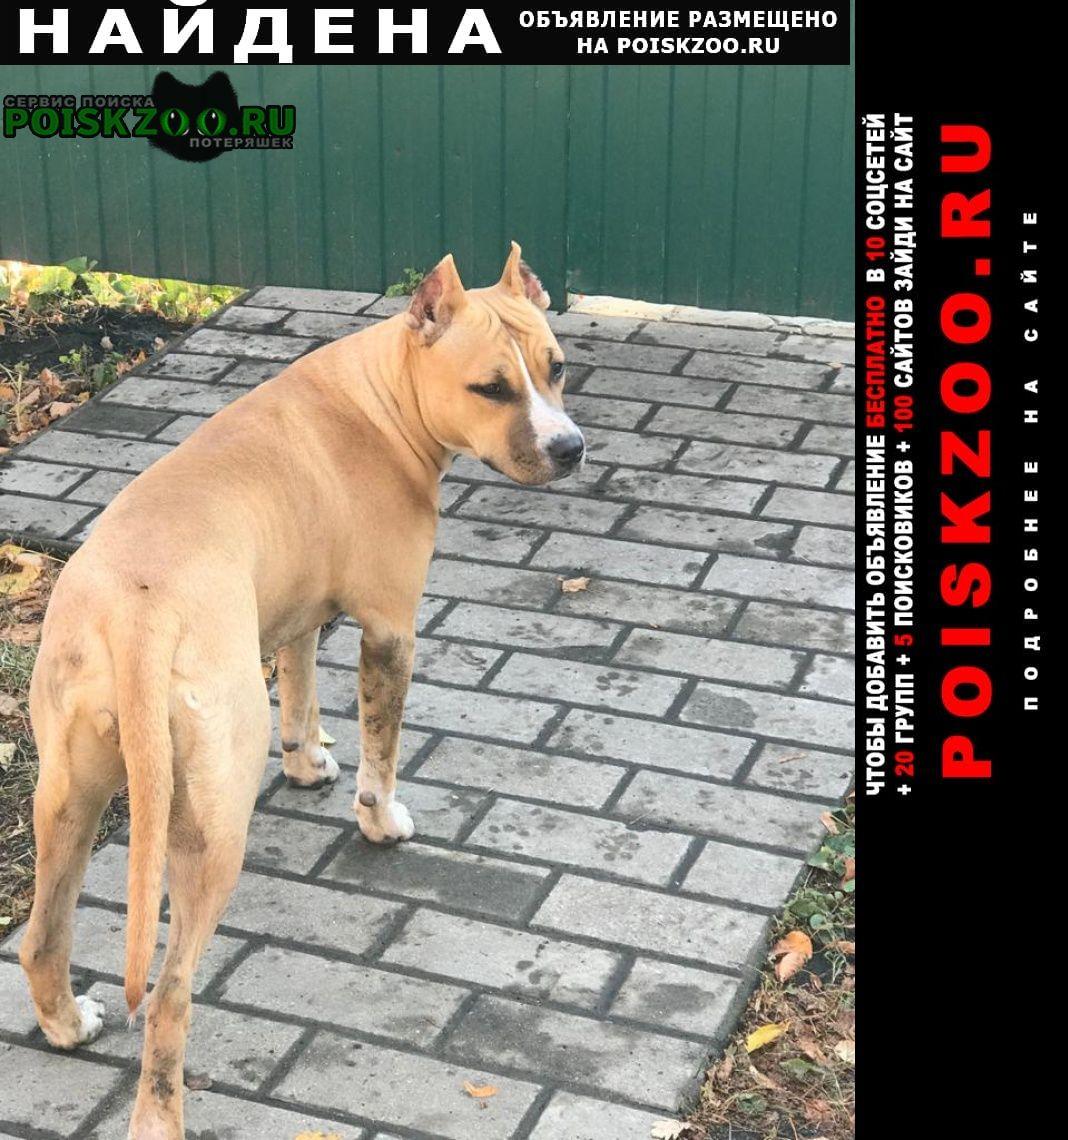 Воронеж Найдена собака